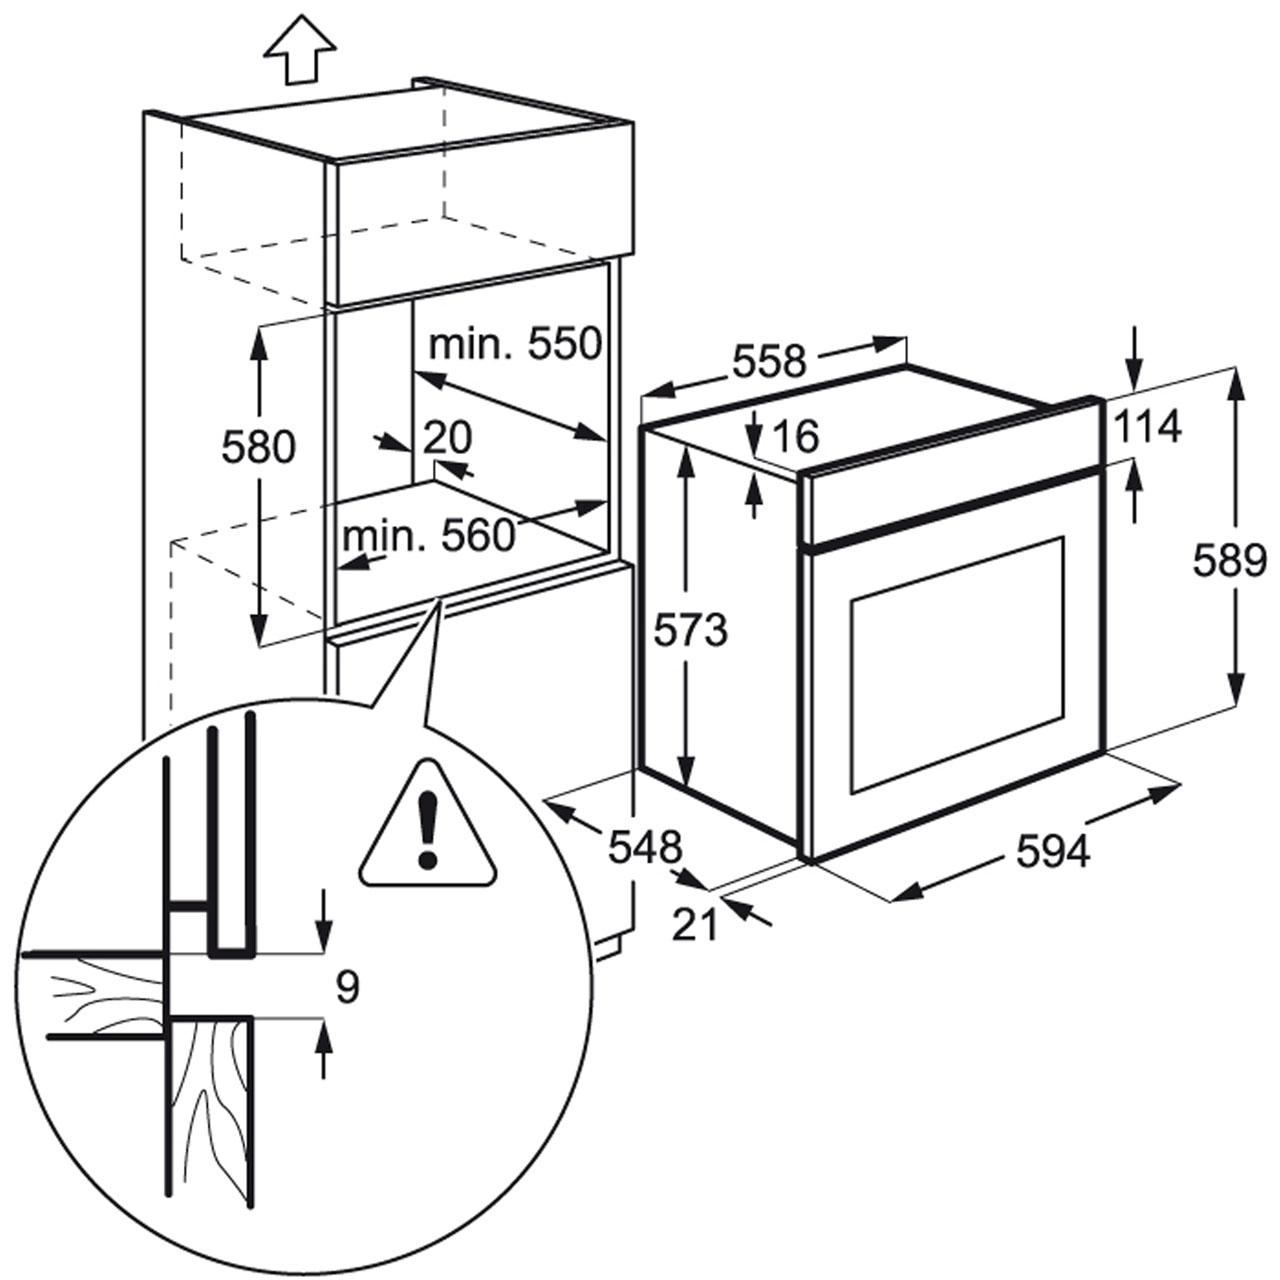 defy stove wiring diagram stove clock wiring diagram